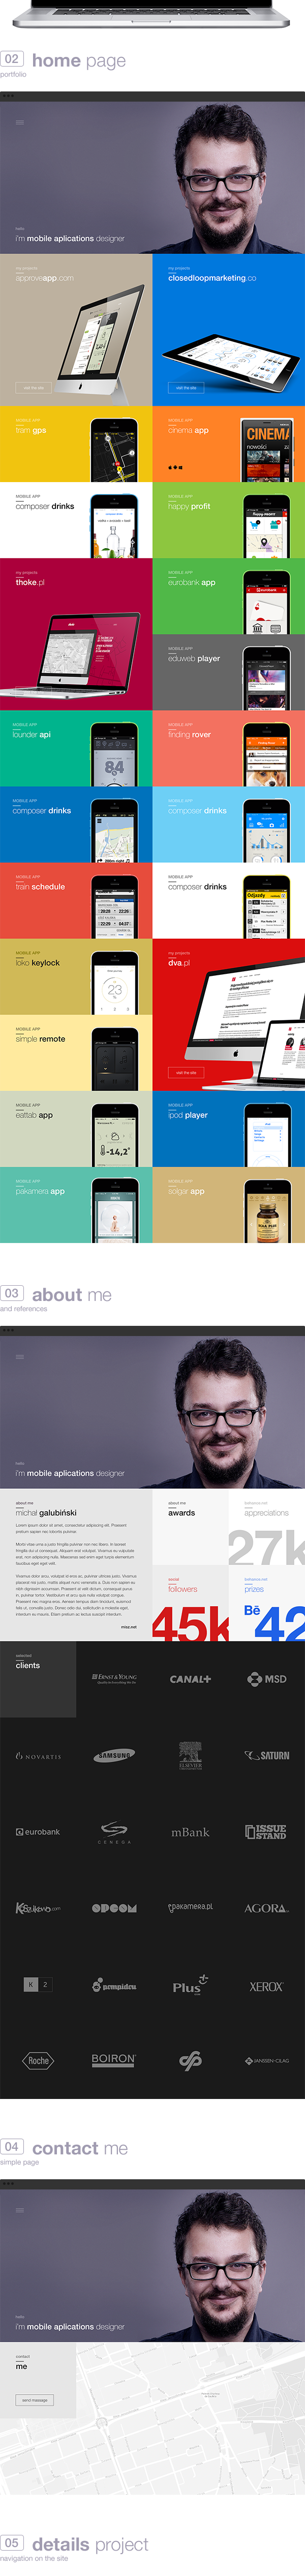 misz.com - portfolio on